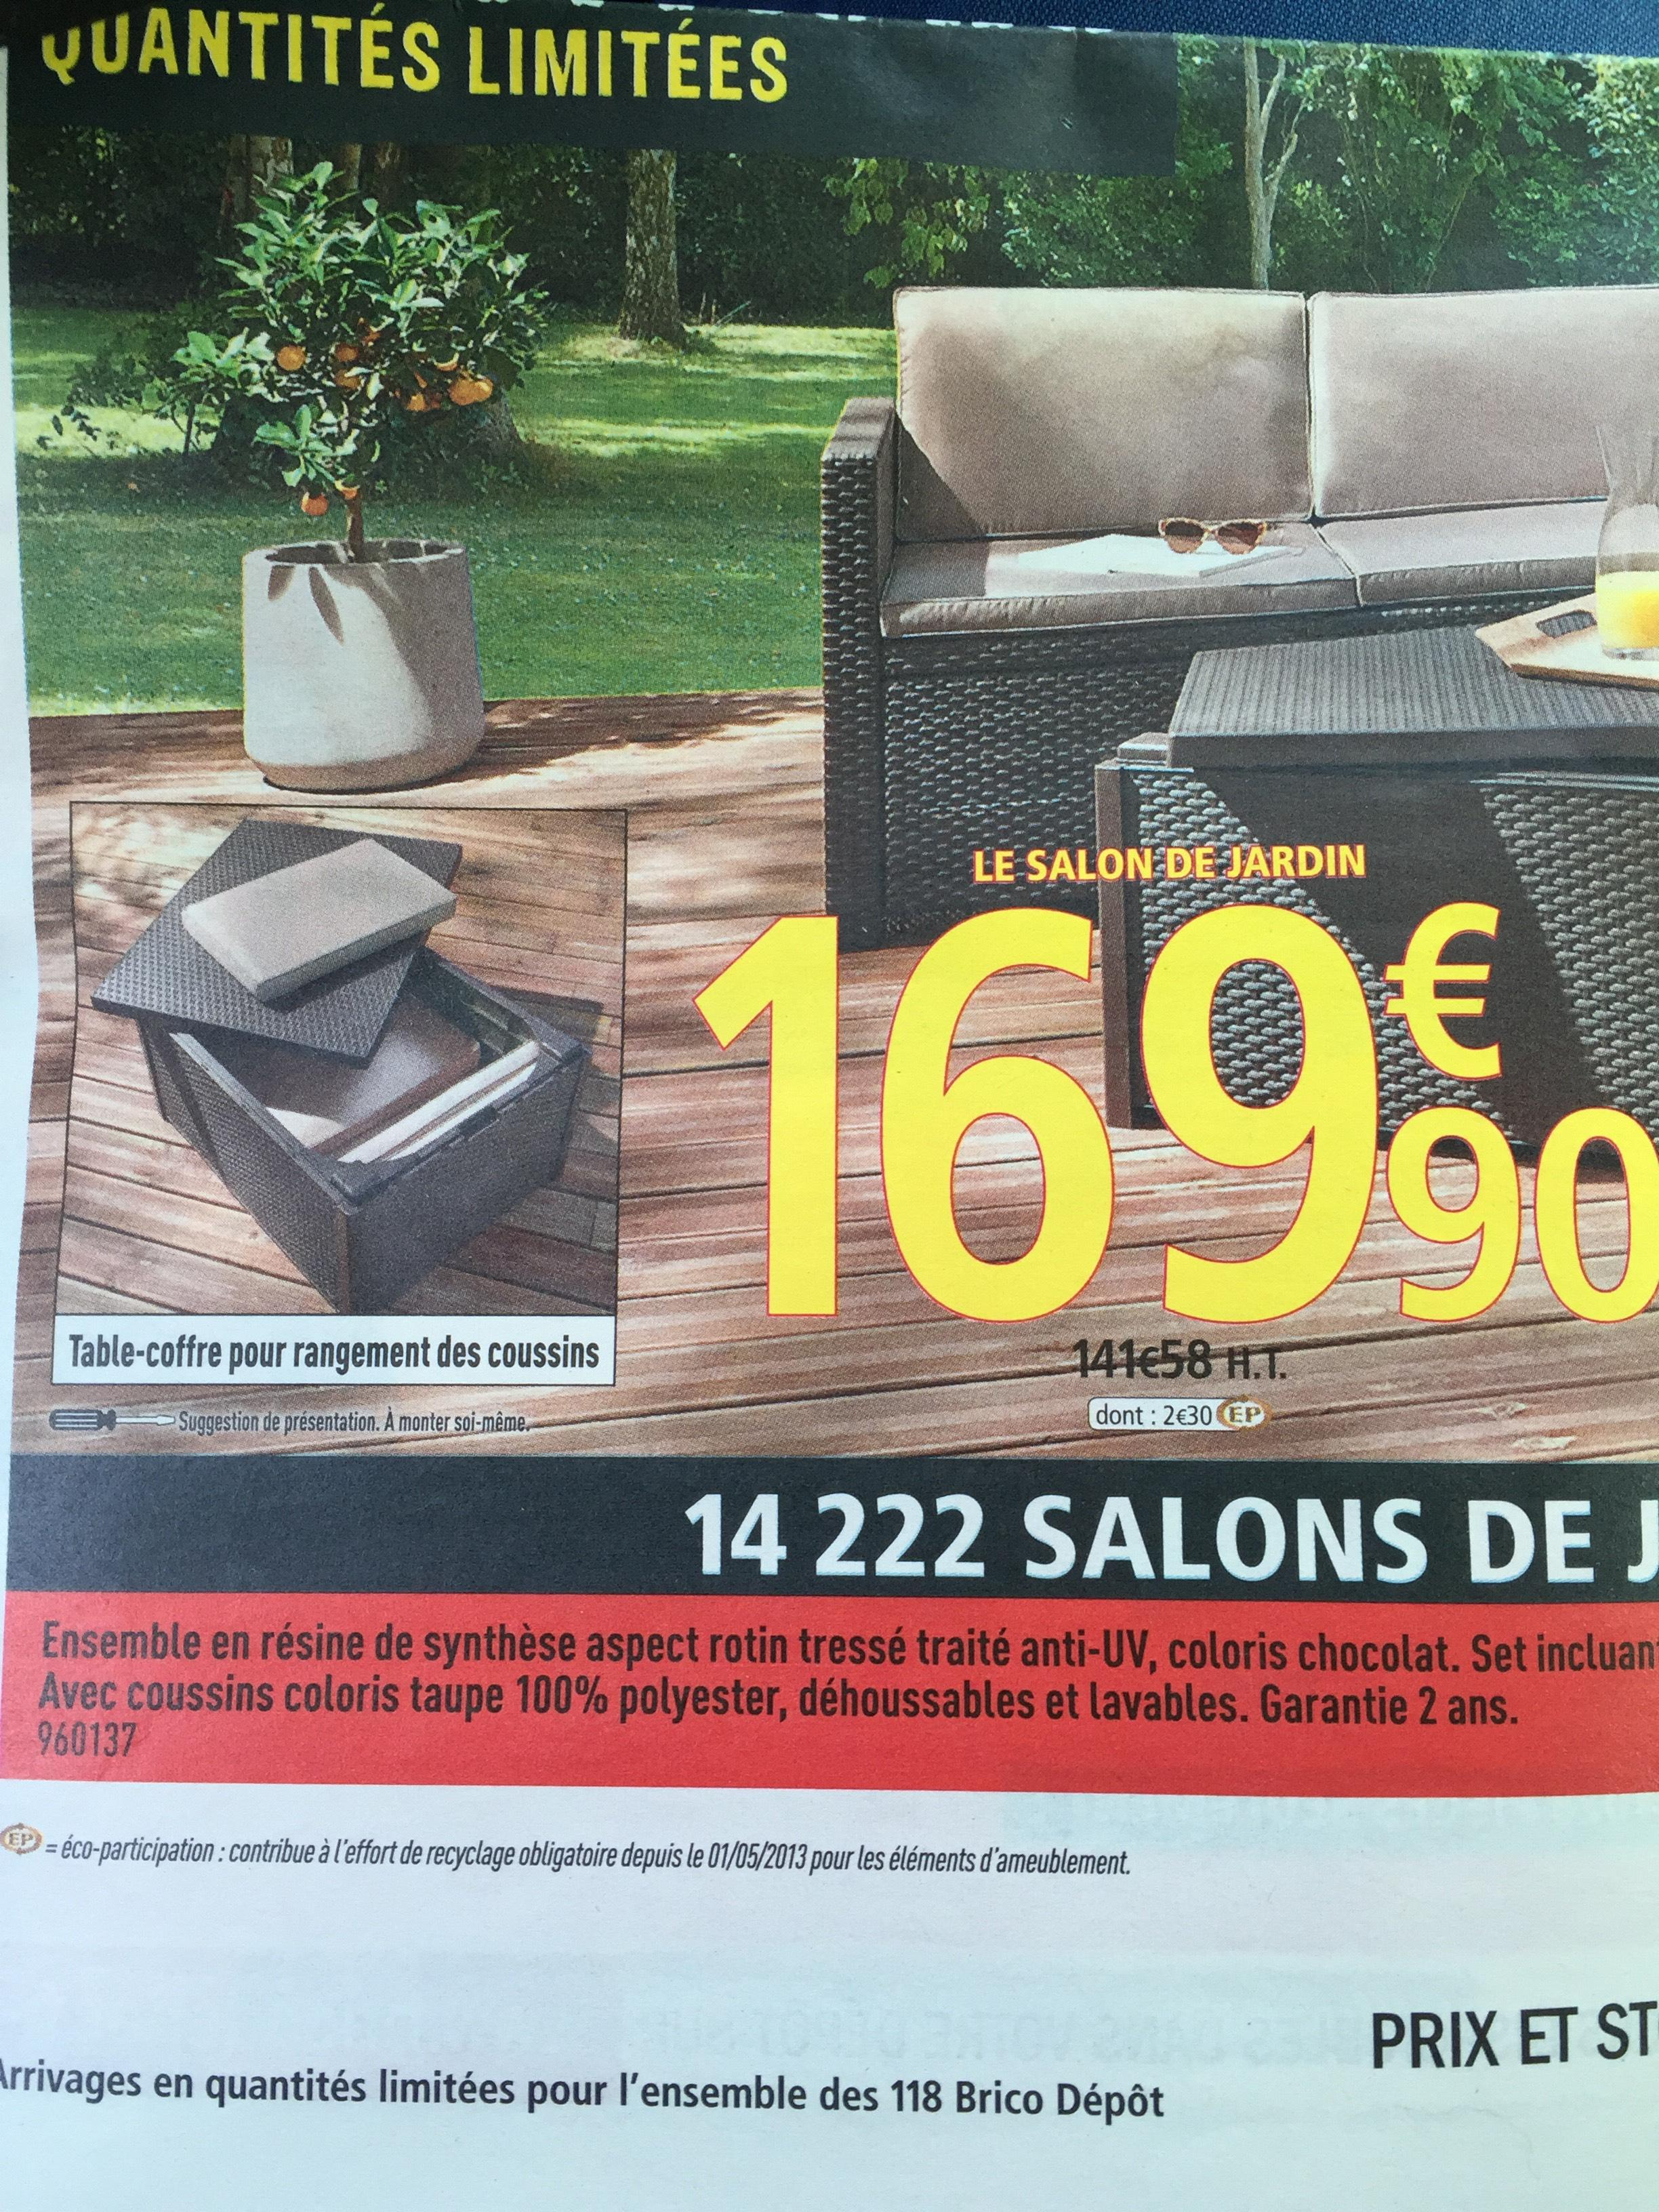 Salon de jardin allibert brico depot 2016 ch let maison - Allibert salon de jardin brico depot ...